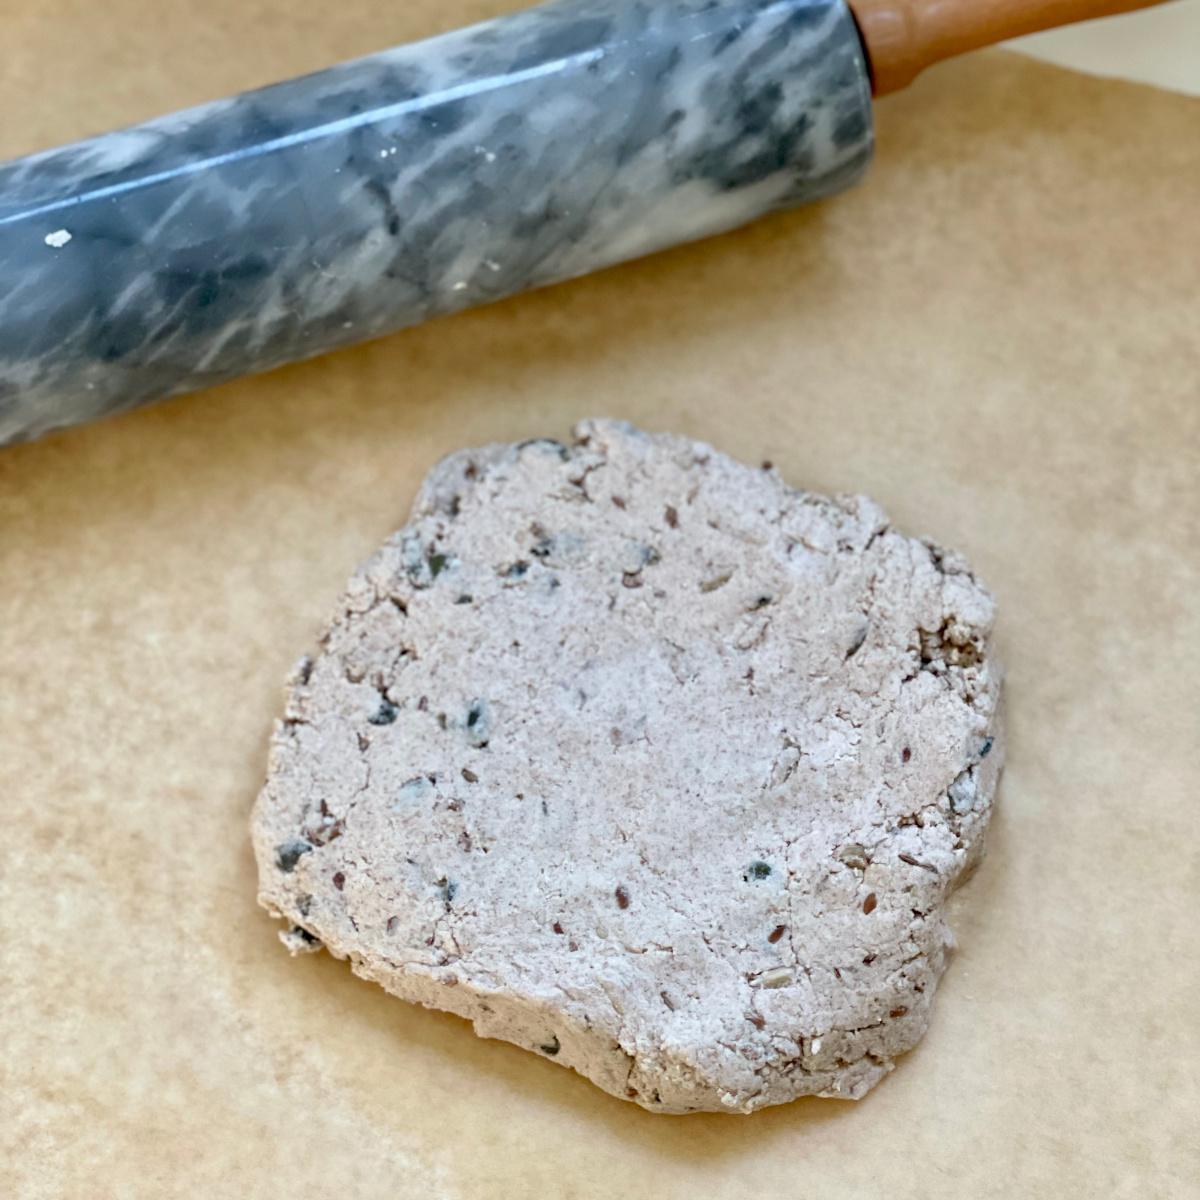 Semínkový Lavash sčočkovým hummusem